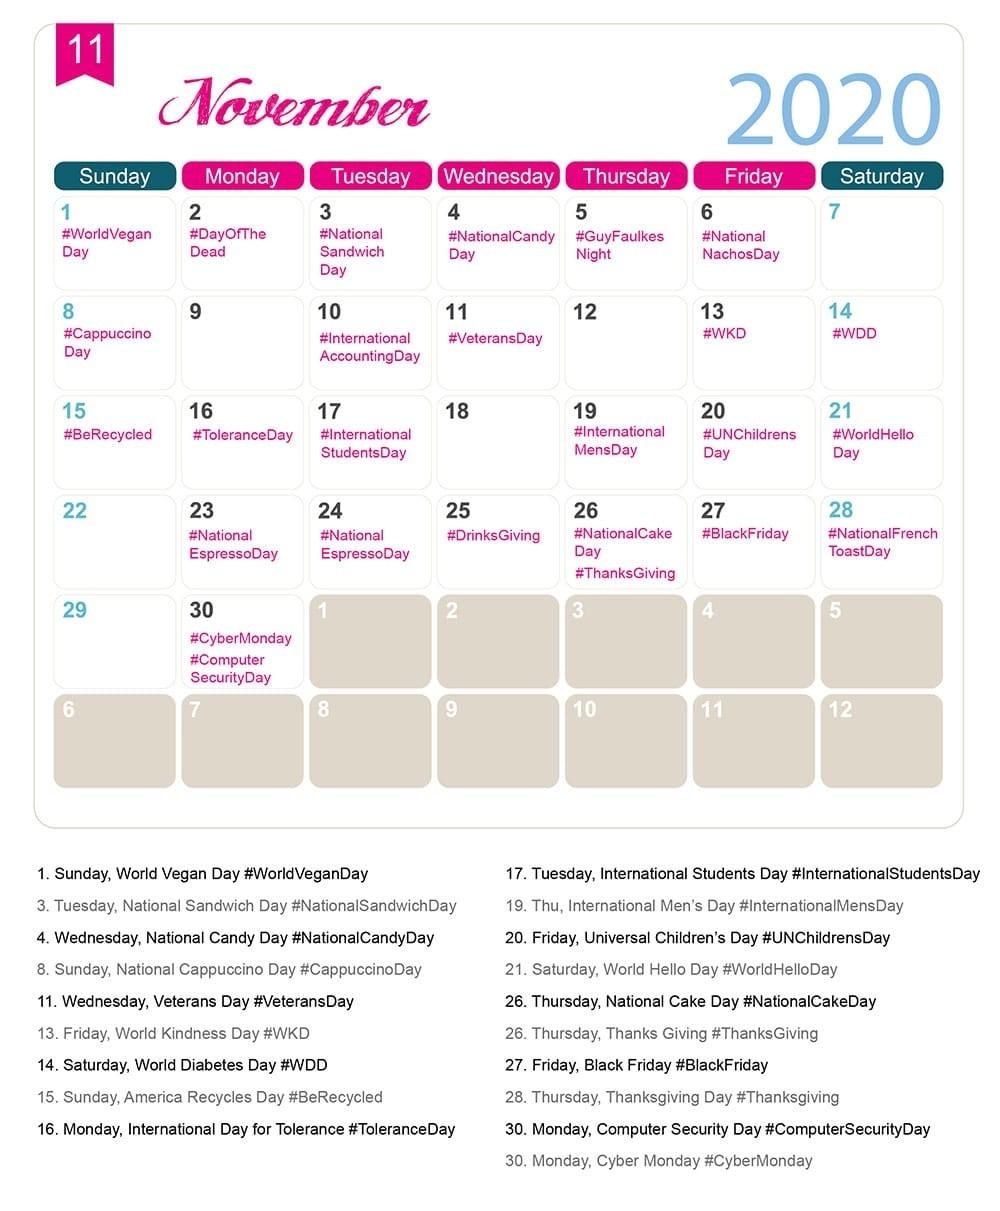 The 2020 Social Media Holiday Calendar - Make A Website Hub-Calendar Of National Food Holidays 2020